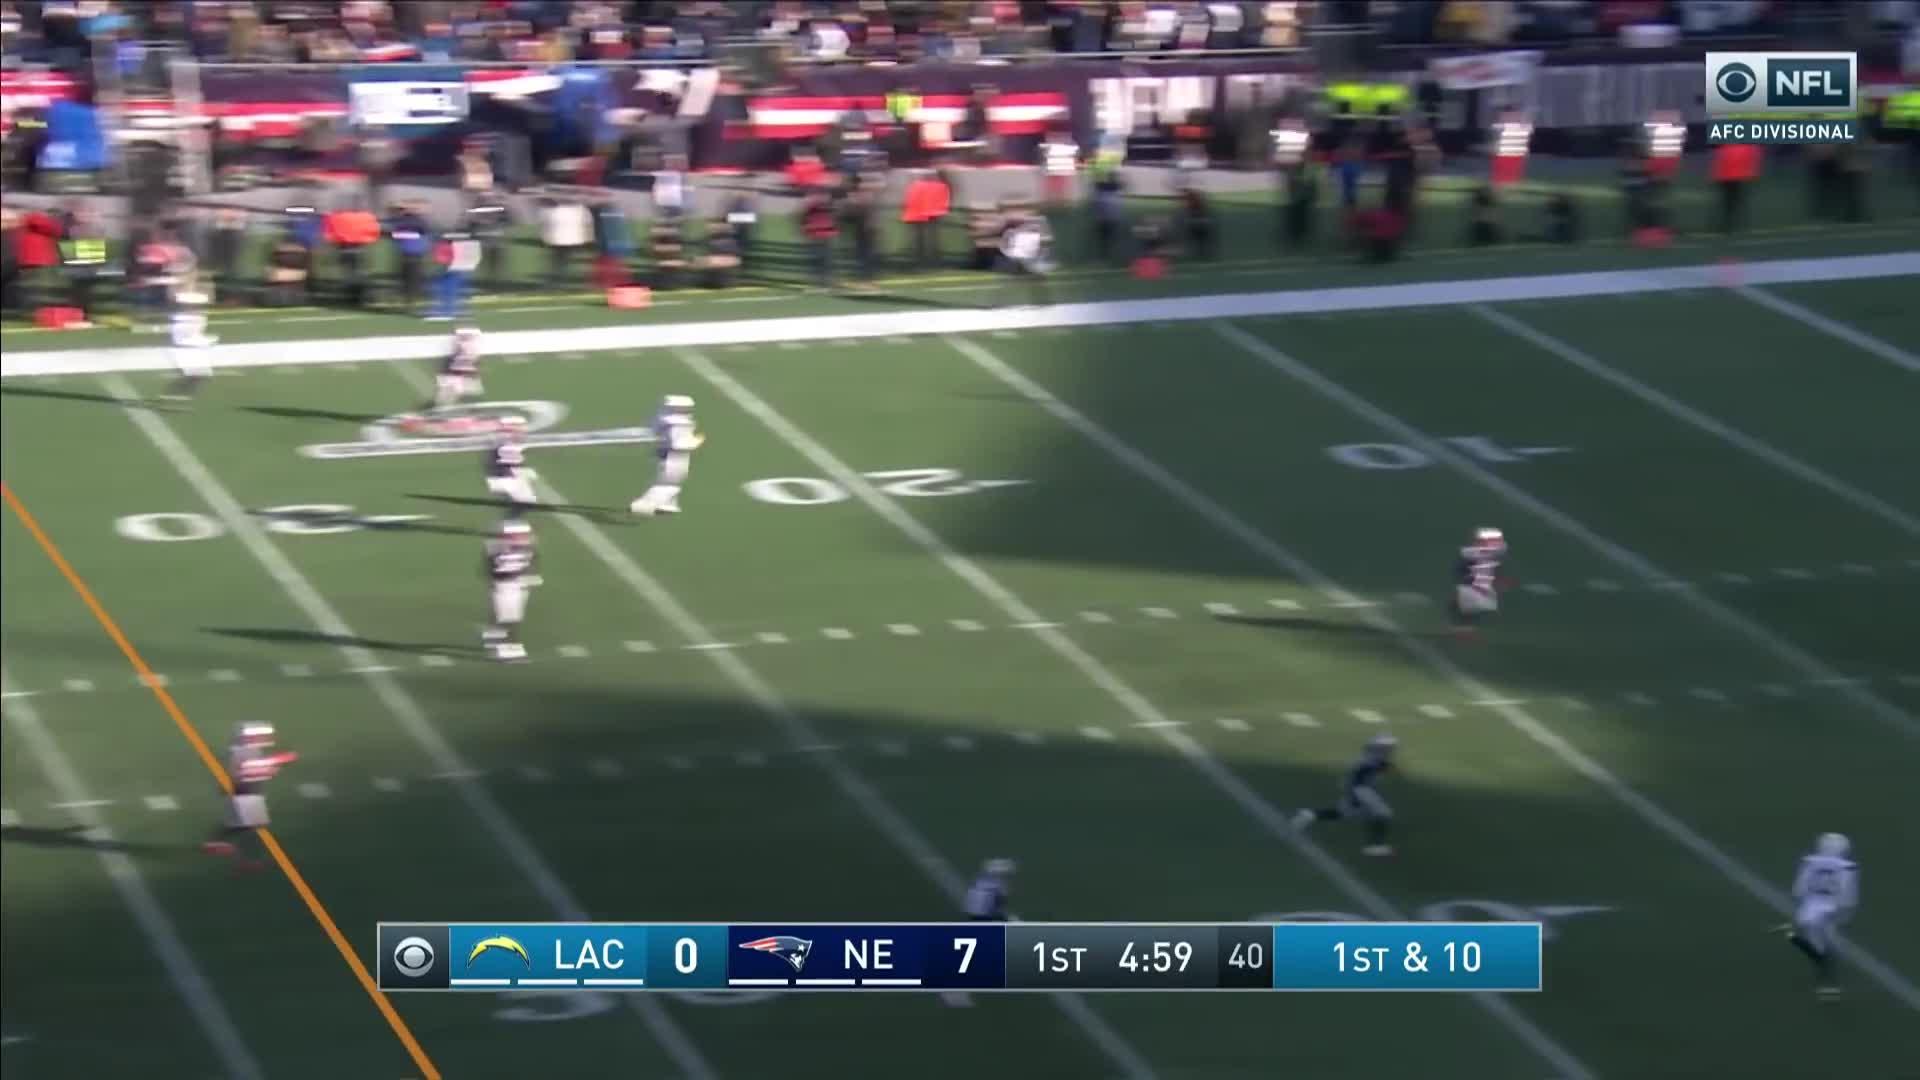 Football, NFL, keenan allen, los angeles chargers, touchdown, Keenan Allen Touchdown GIFs